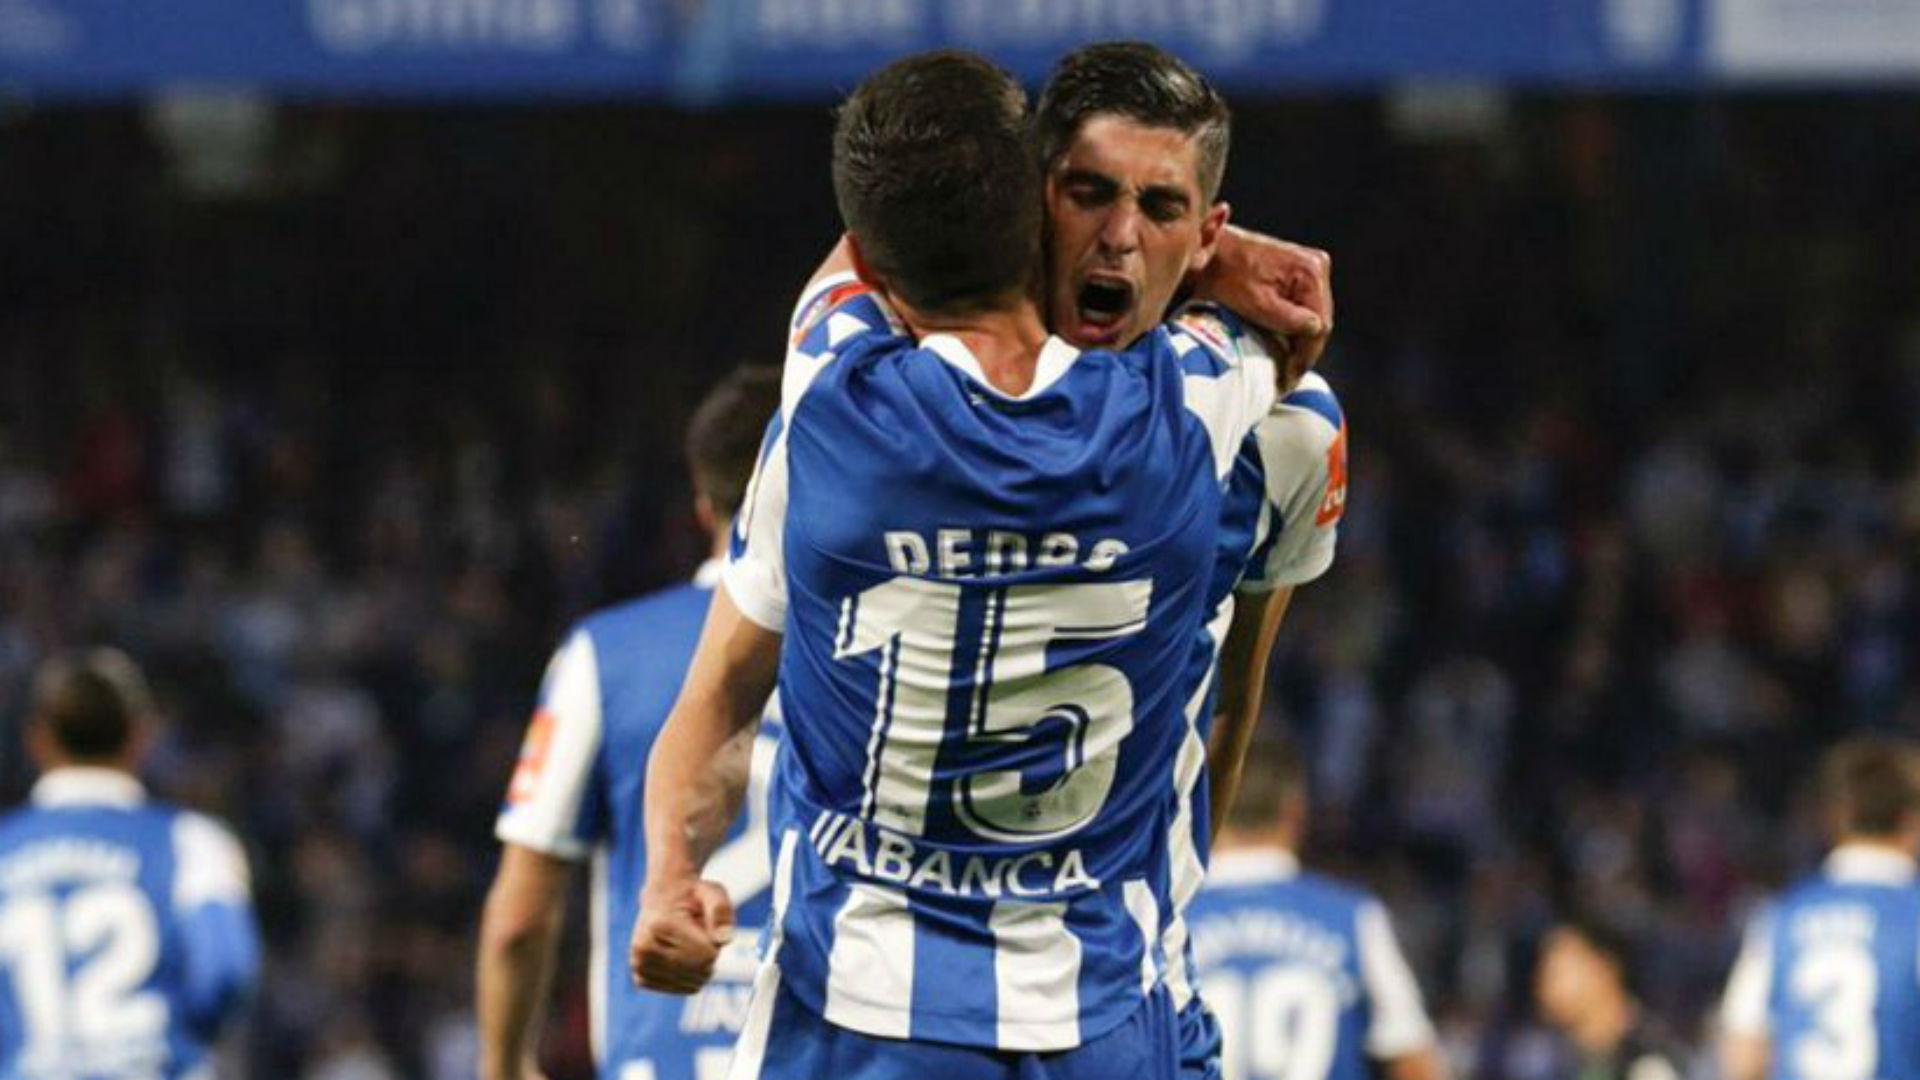 Deportivo La Coruna 4 Malaga 2: Fernandez brace puts Depor on brink of play-off final